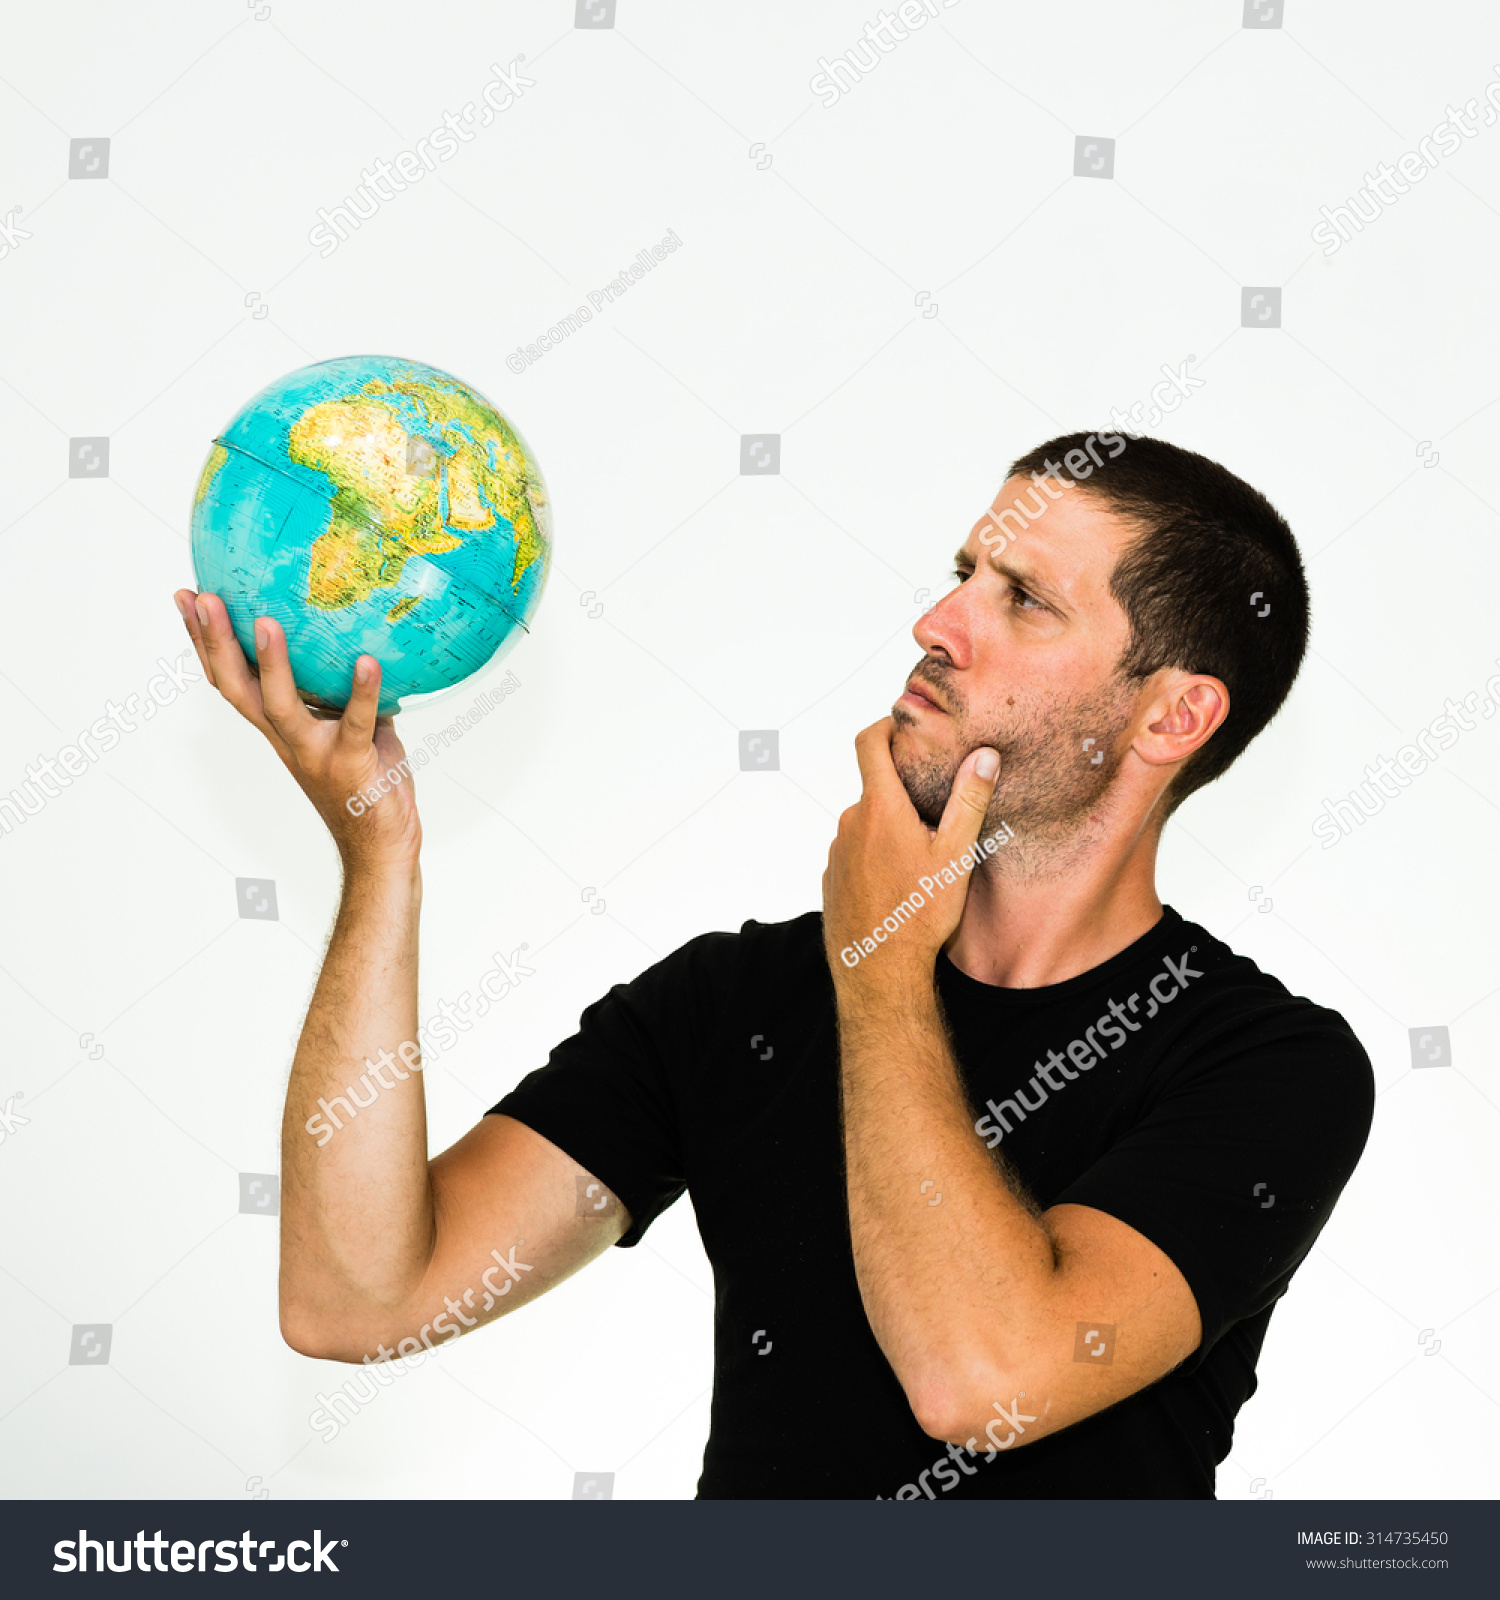 Observing man photo